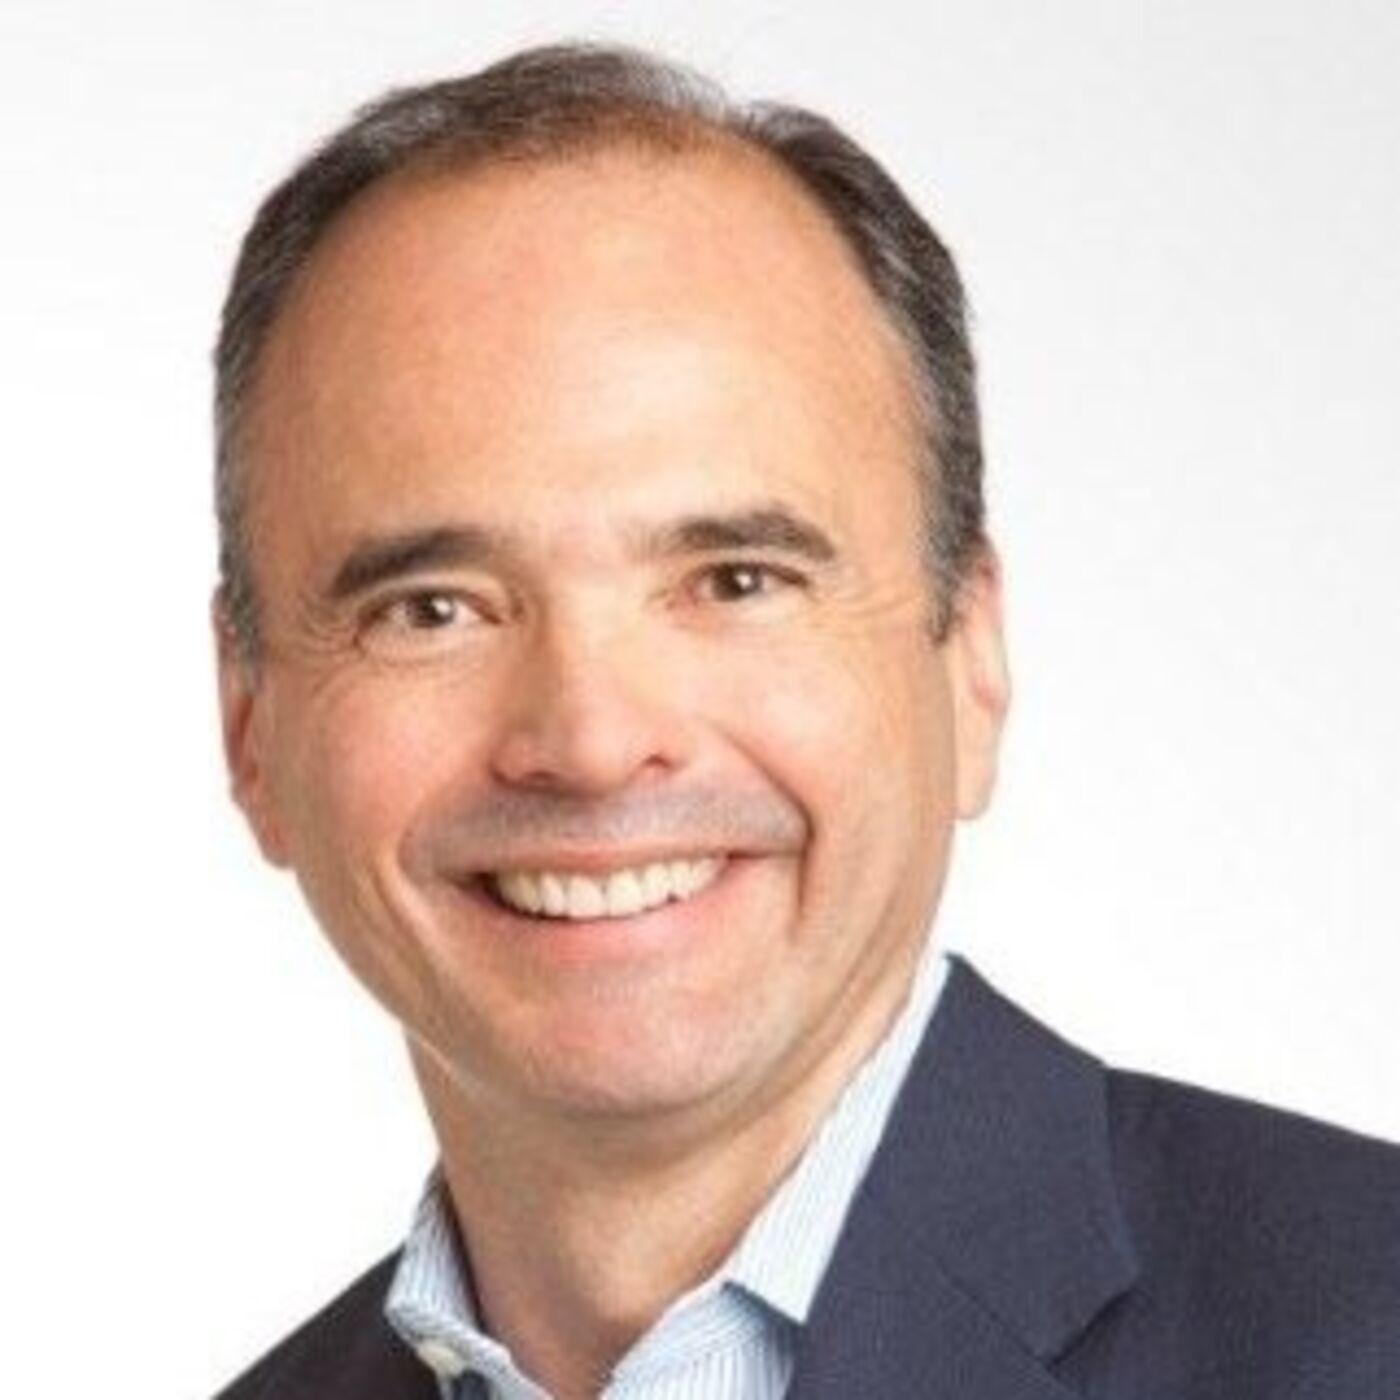 #07: Gustavo López, CSCO at Kimberly-Clark & Co-Founder SmarterChains